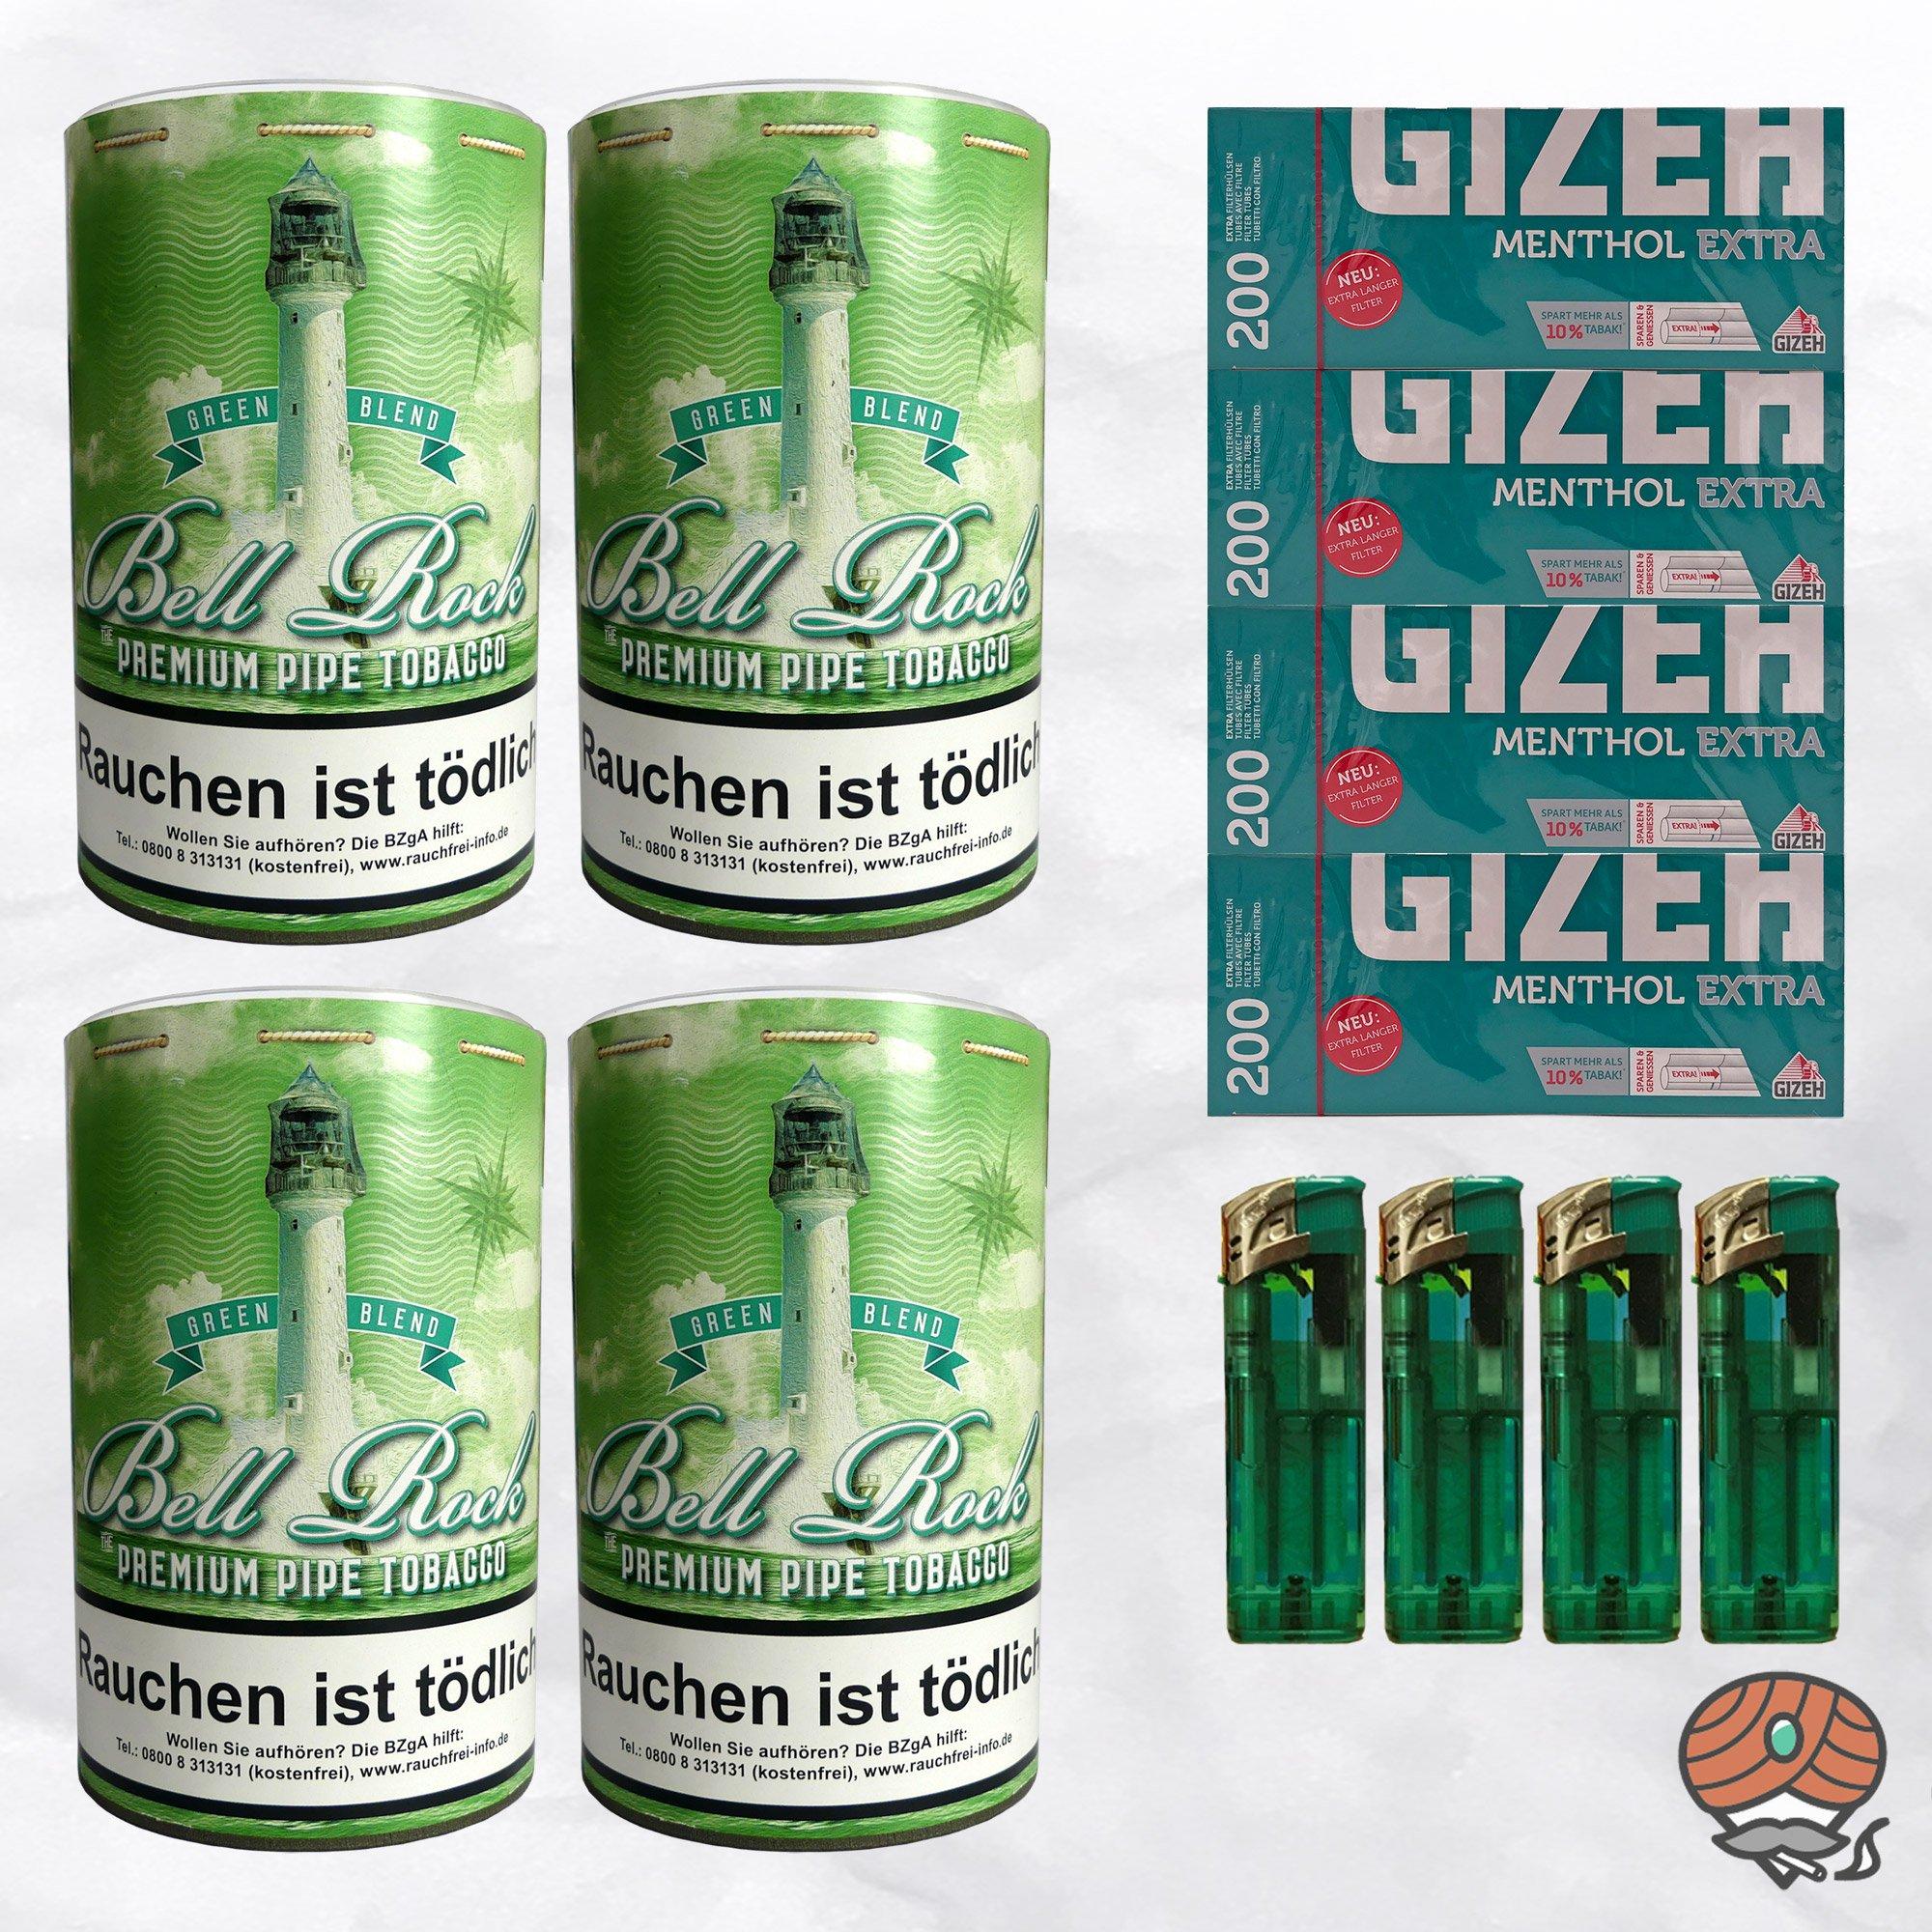 4 x Bell Rock Green Blend Menthol Pfeifentabak 160g Dose + 800 Menthol Extra-Hülsen